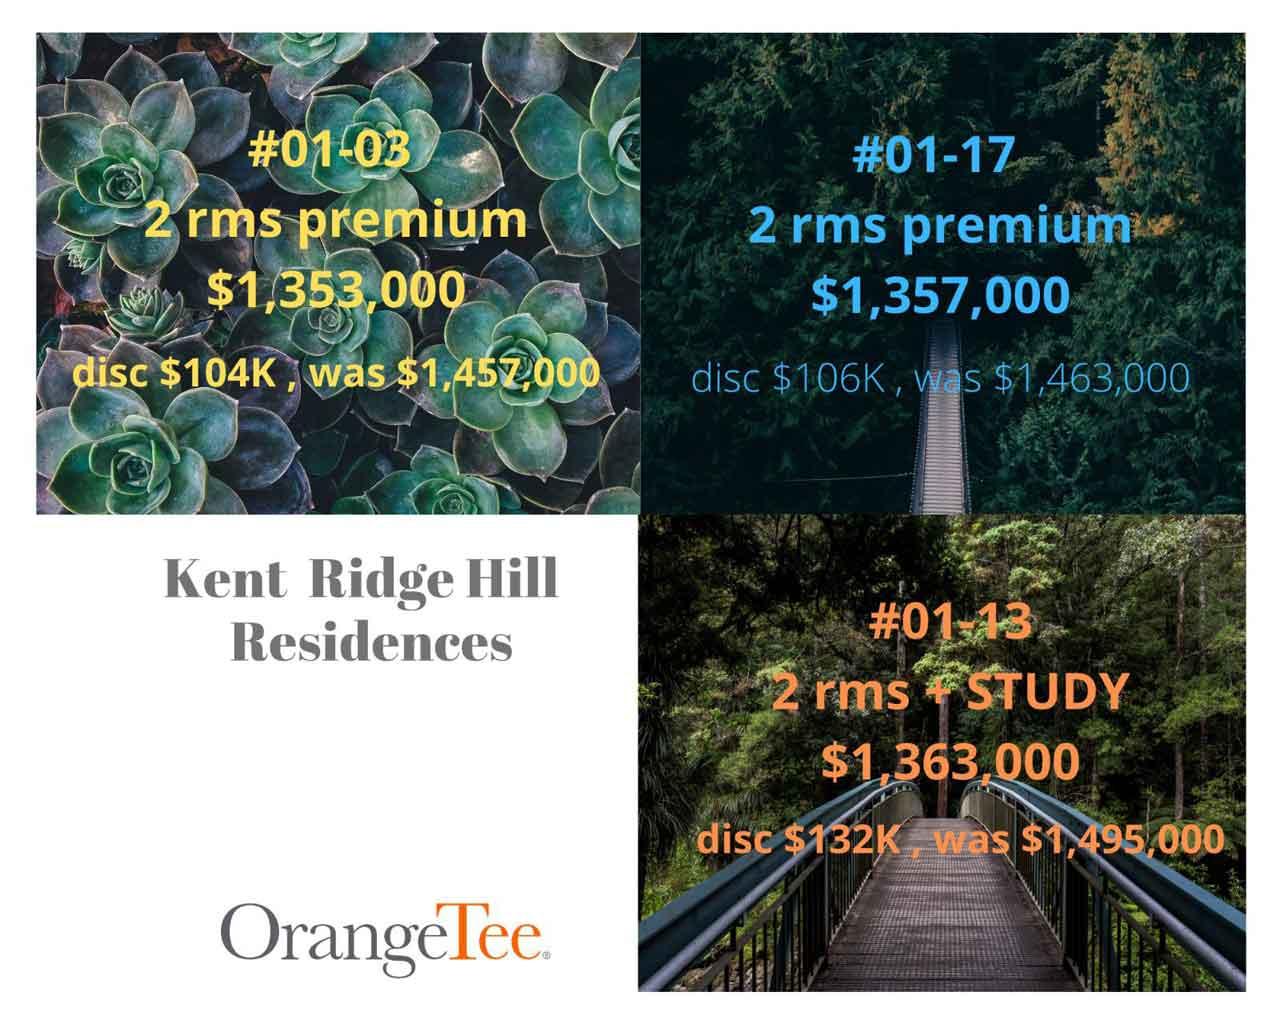 kent ridge hill residences discounts